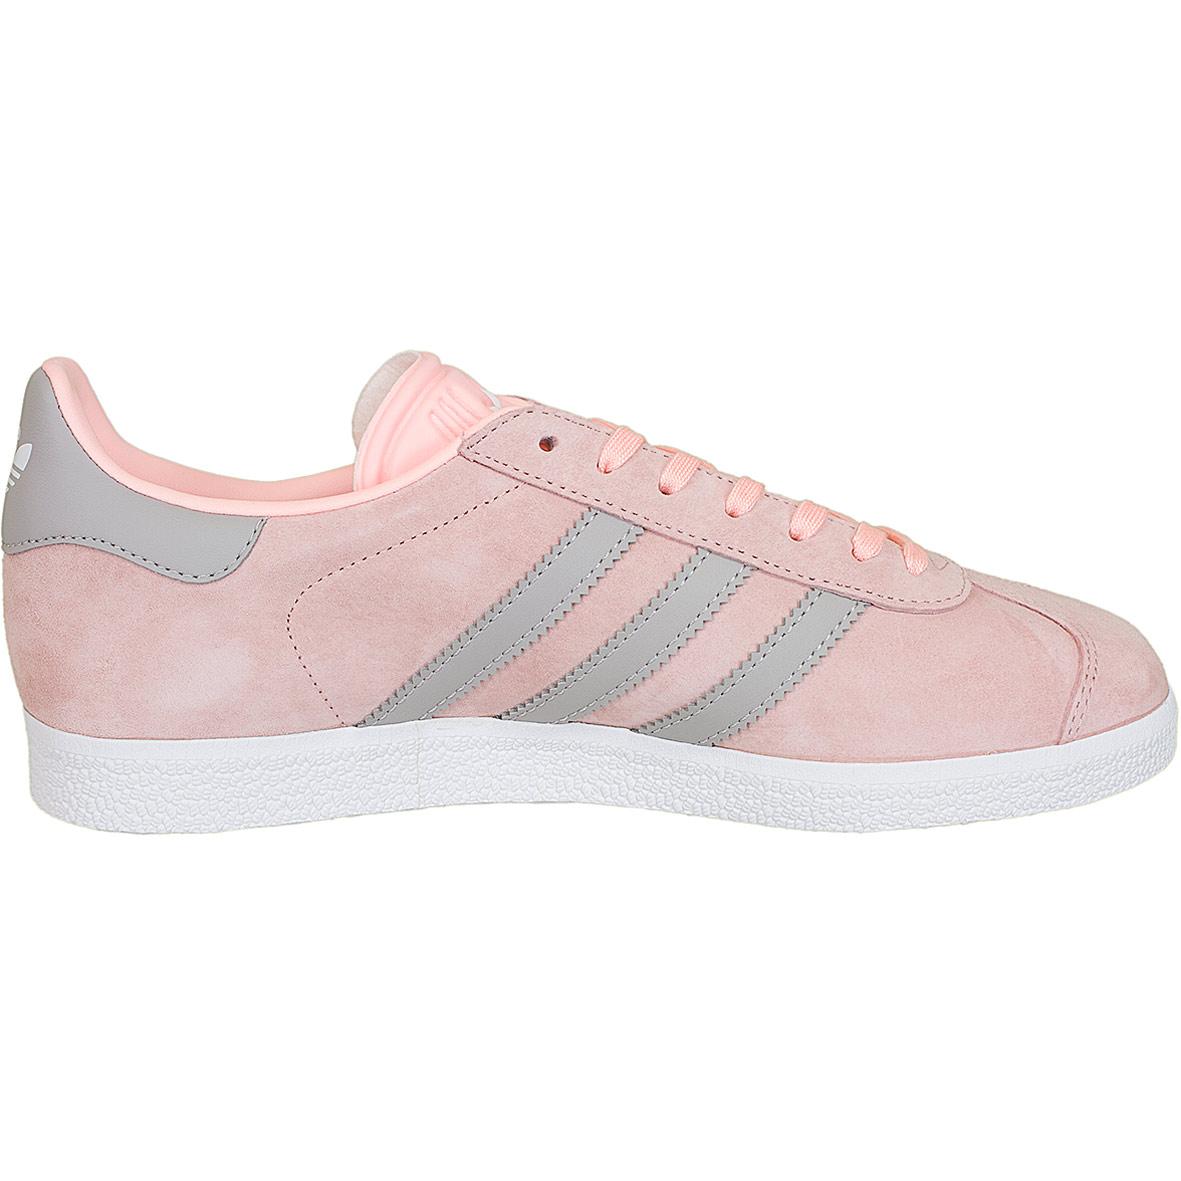 adidas turnschuhe grau rosa